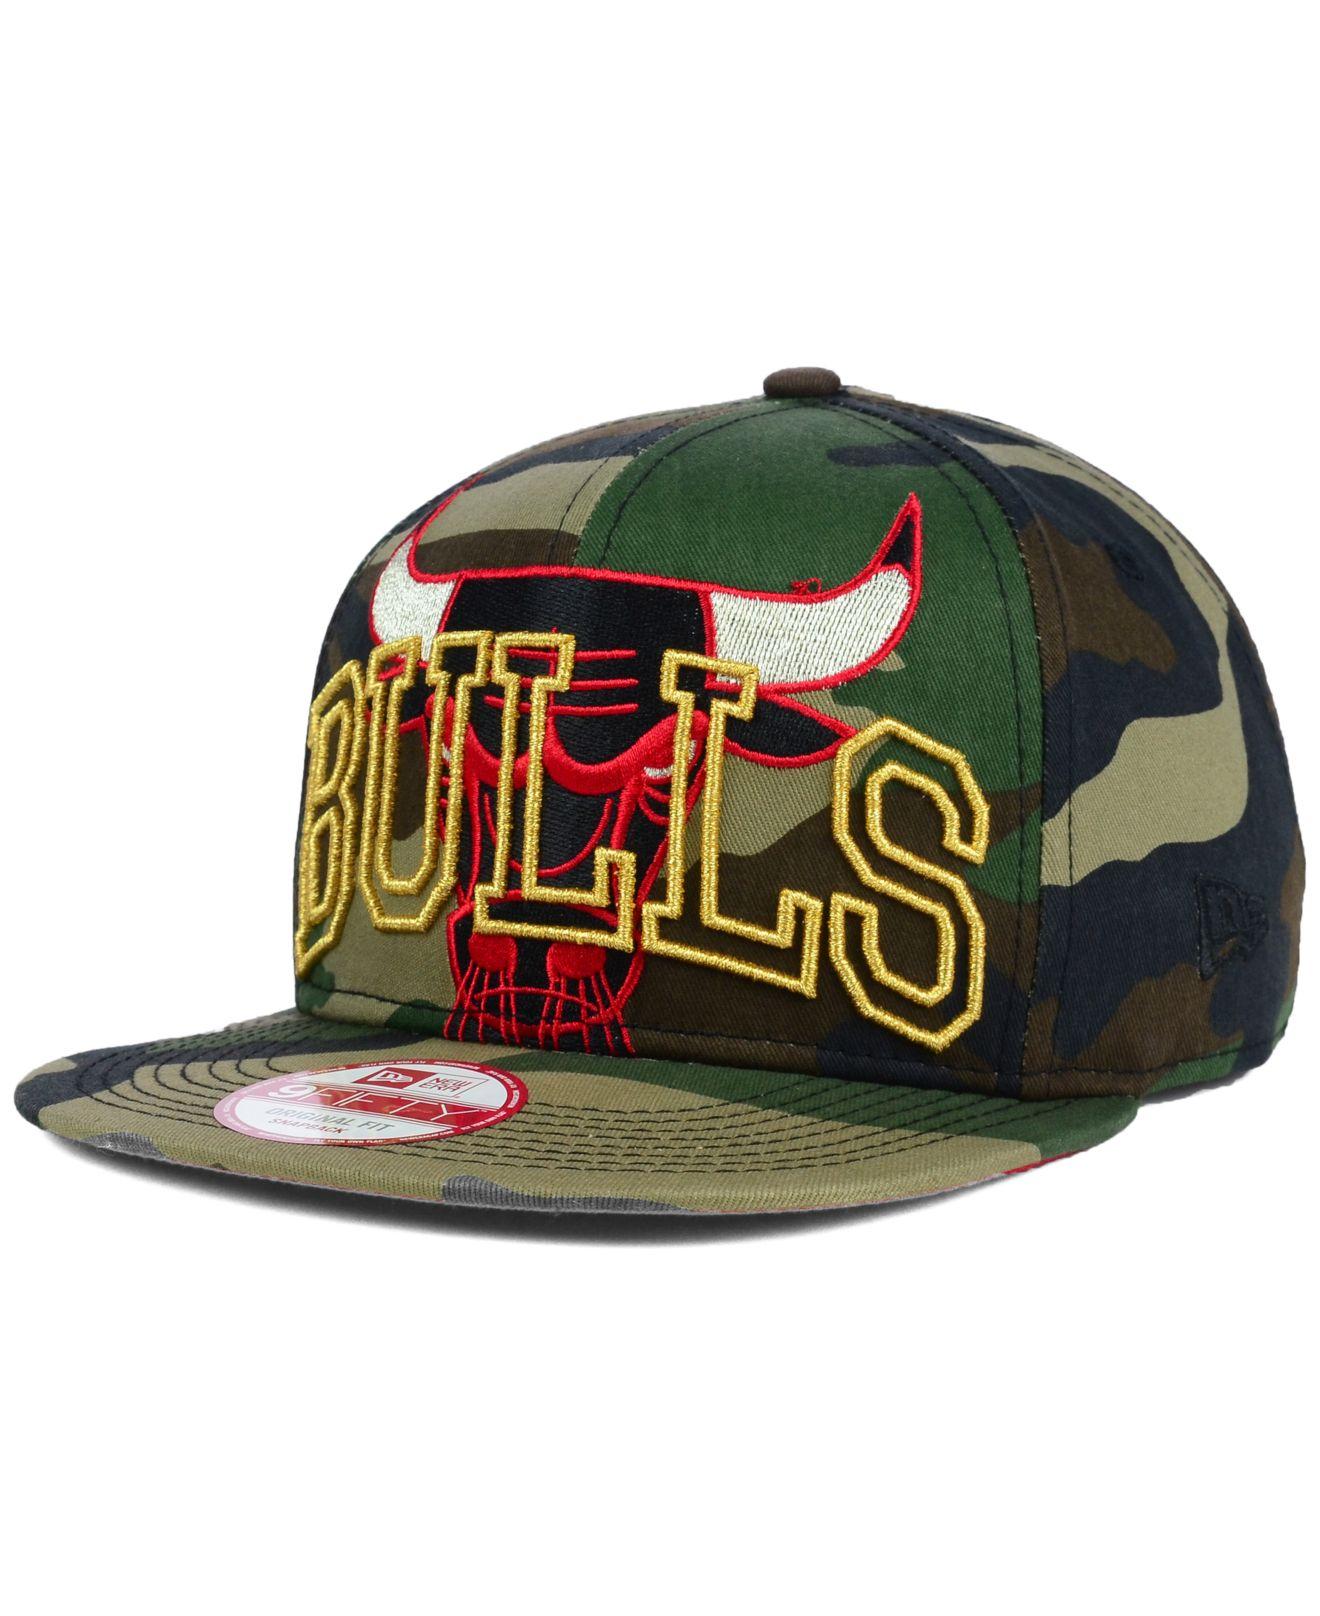 brand new 1751e 1ab09 KTZ Chicago Bulls Metallic Cue Original Fit 9Fifty Snapback Cap in ...